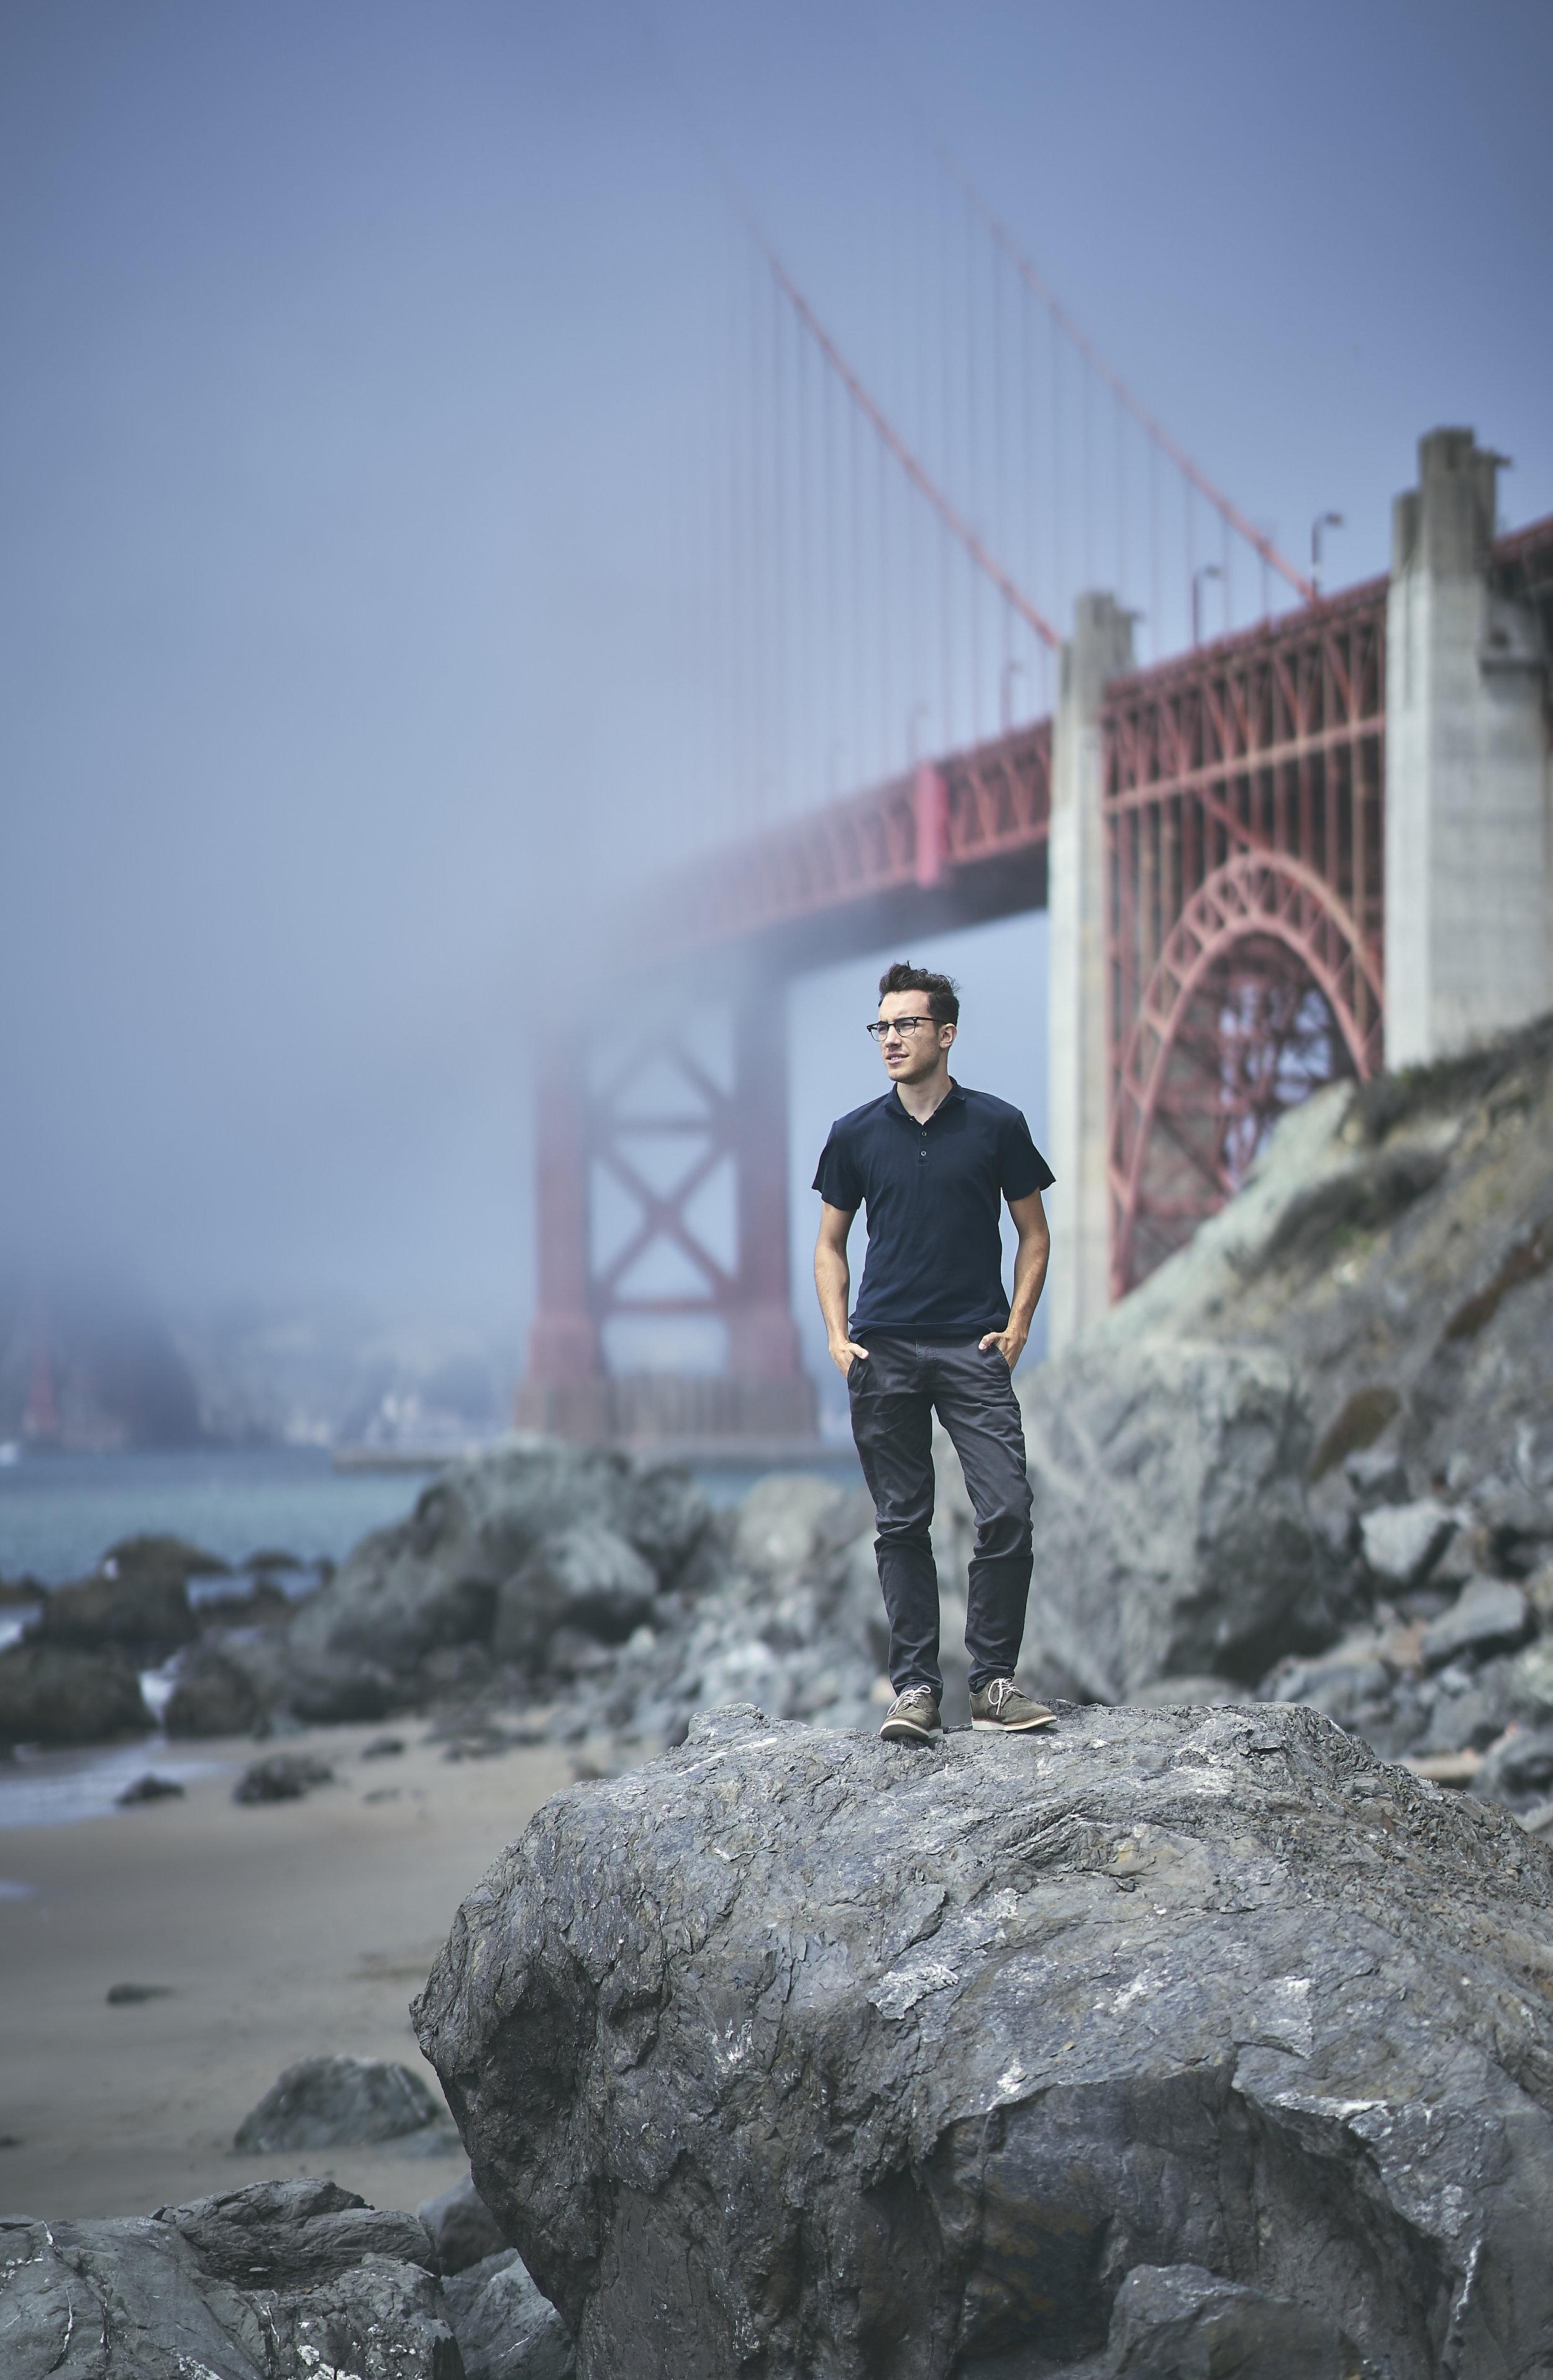 Clark, Golden Gate, 2017